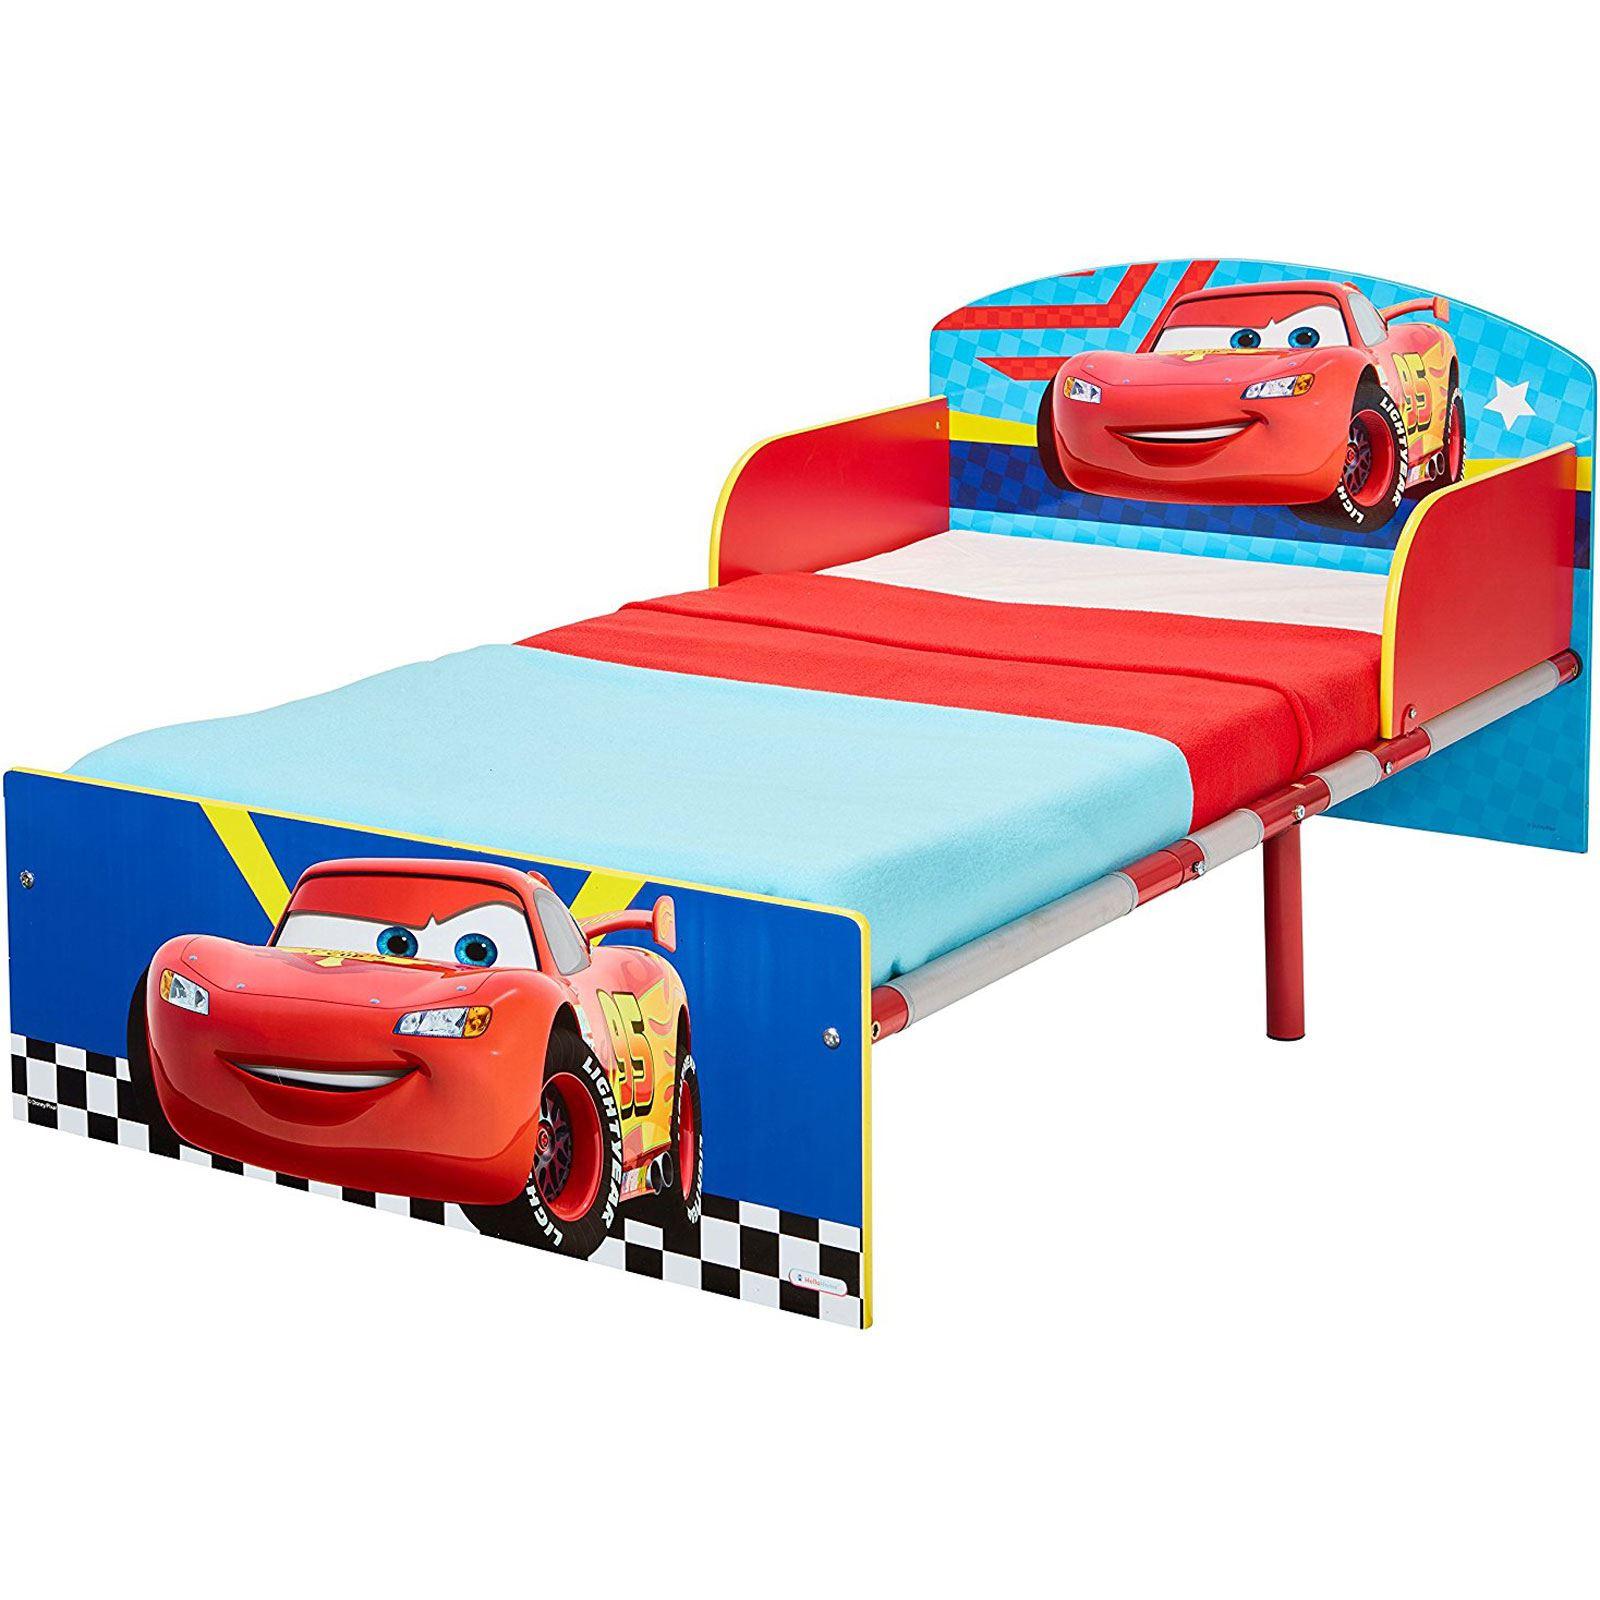 miniatura 7 - KIDS CHARACTER TODDLER BEDS - BOYS GIRLS BEDROOM DISNEY